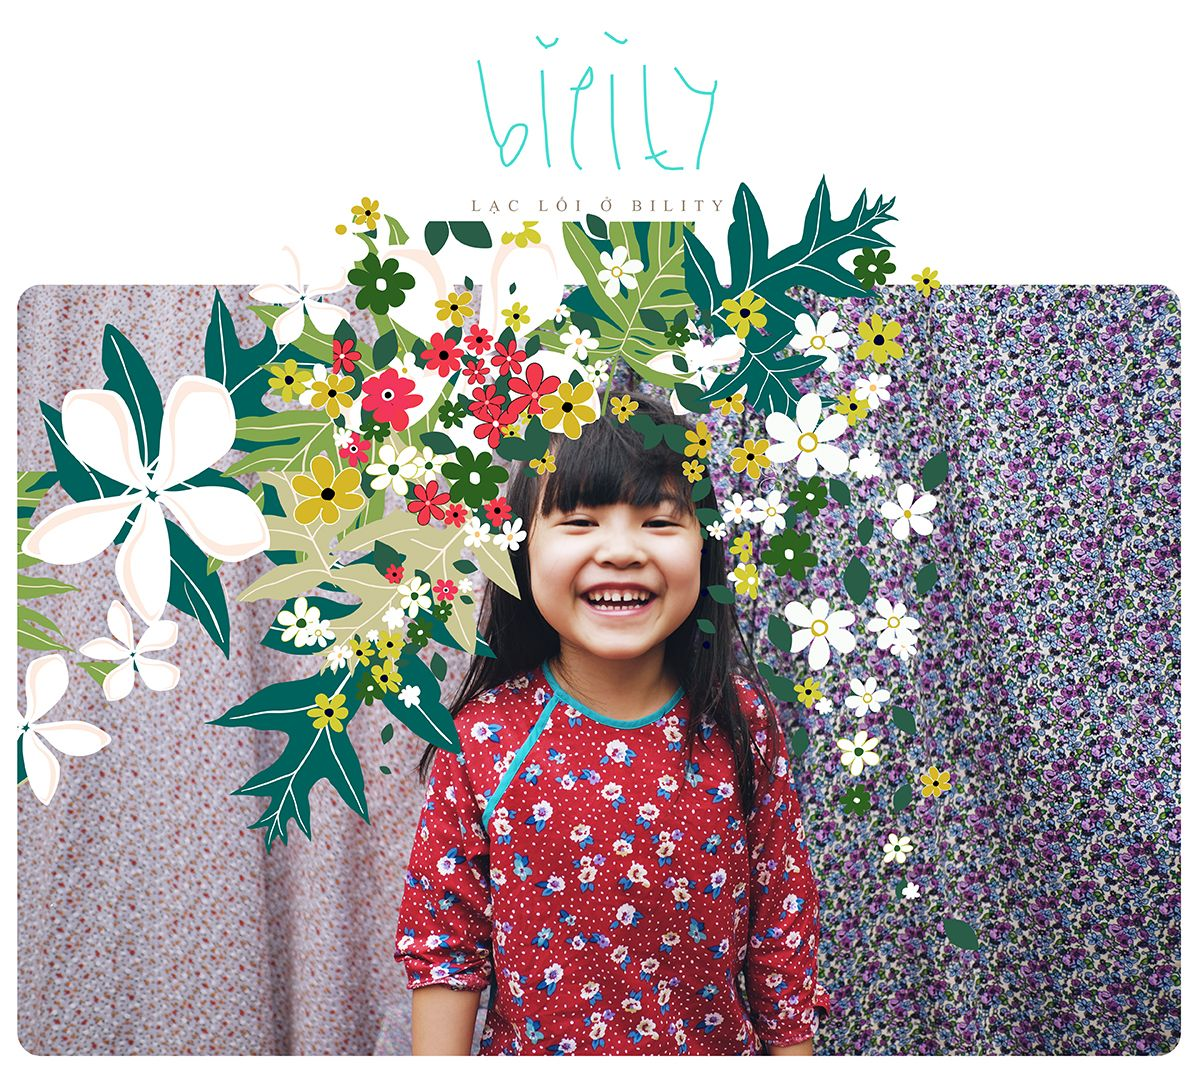 Princesses in Bility <3